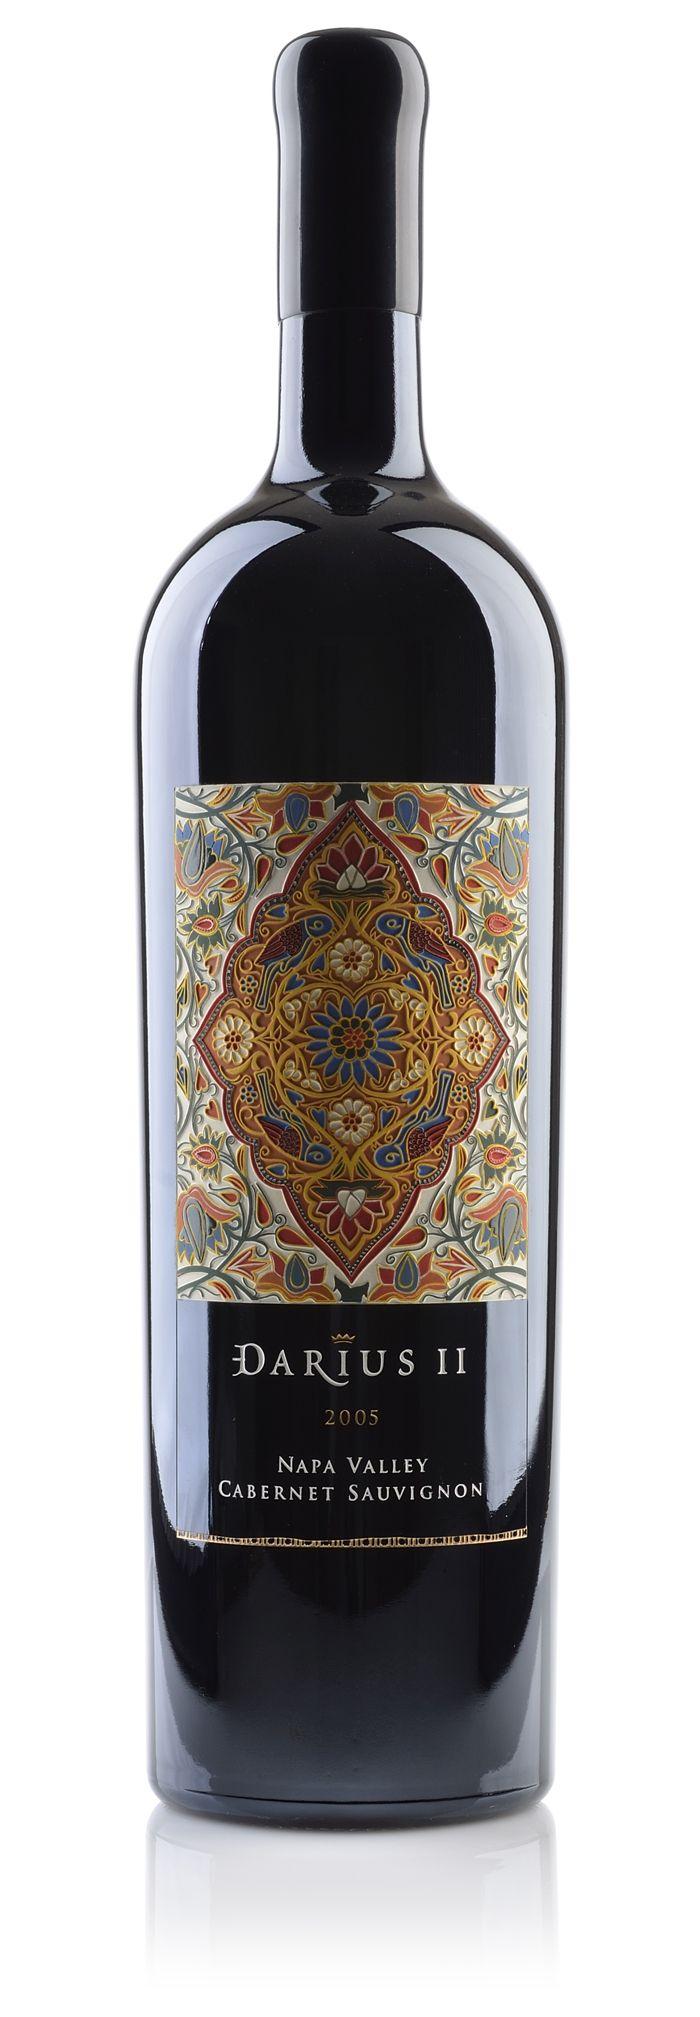 Darioush DariusII - The Dieline